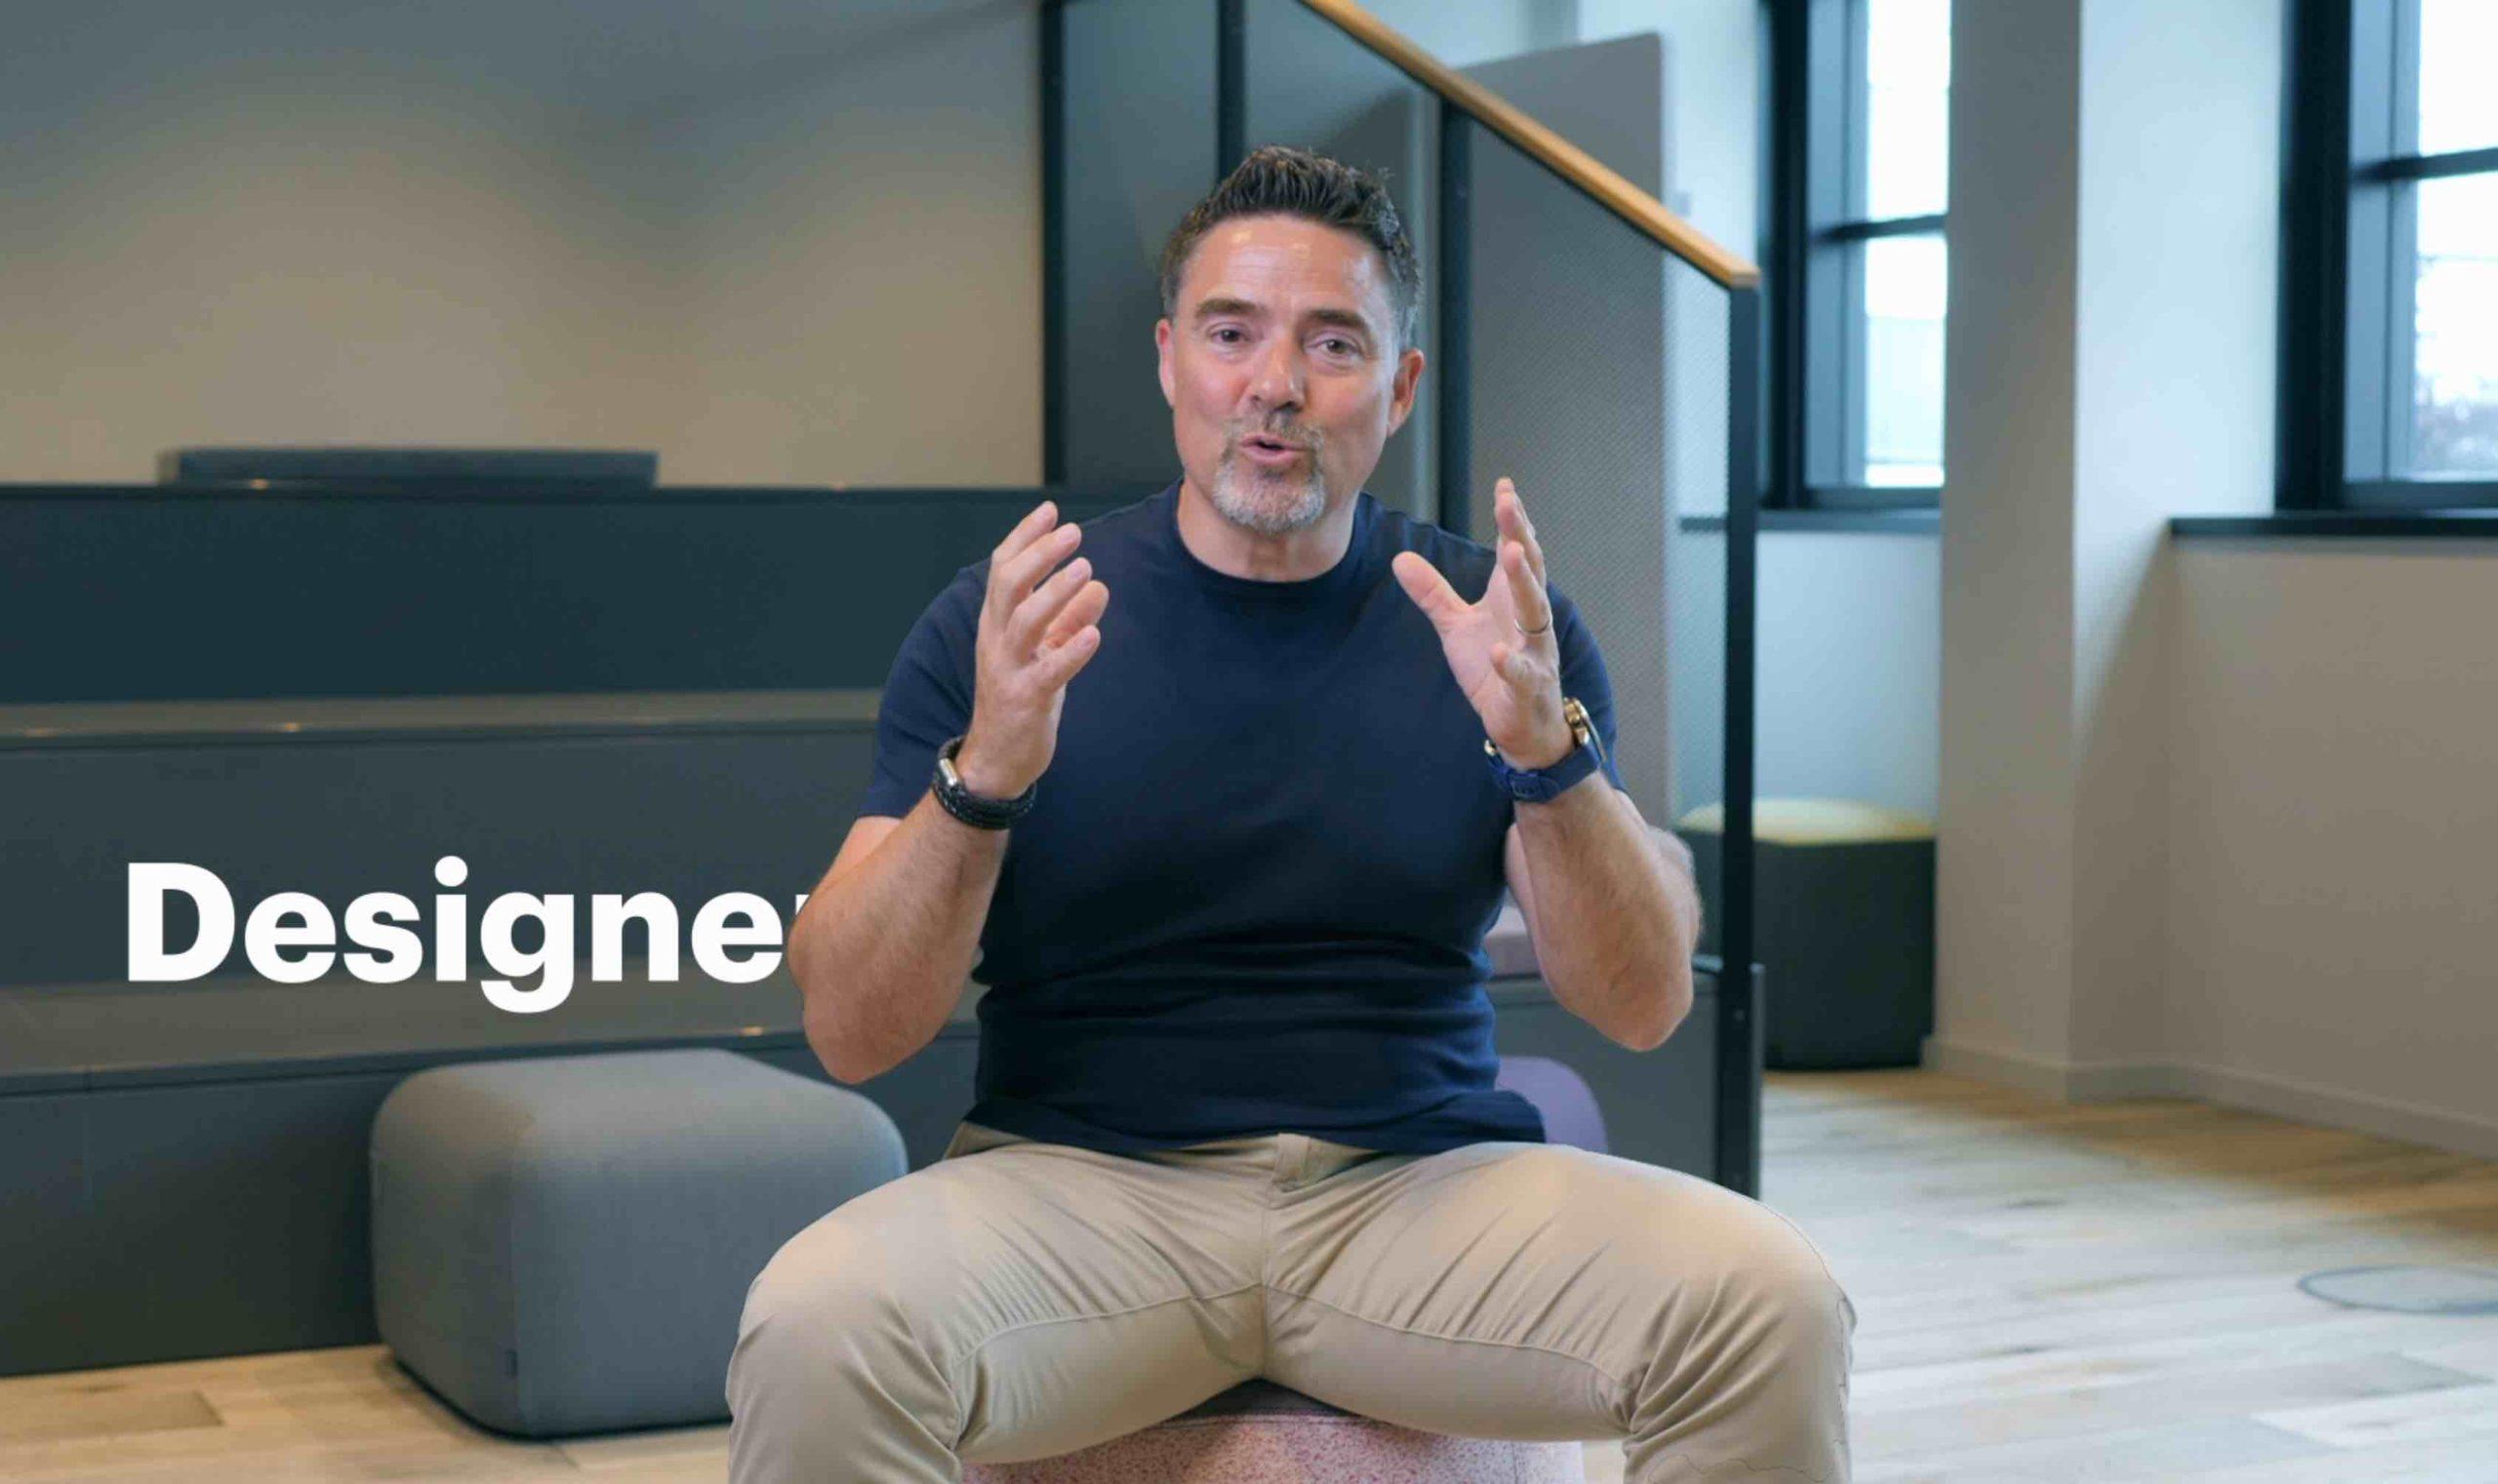 IX Recruiting - Accenture